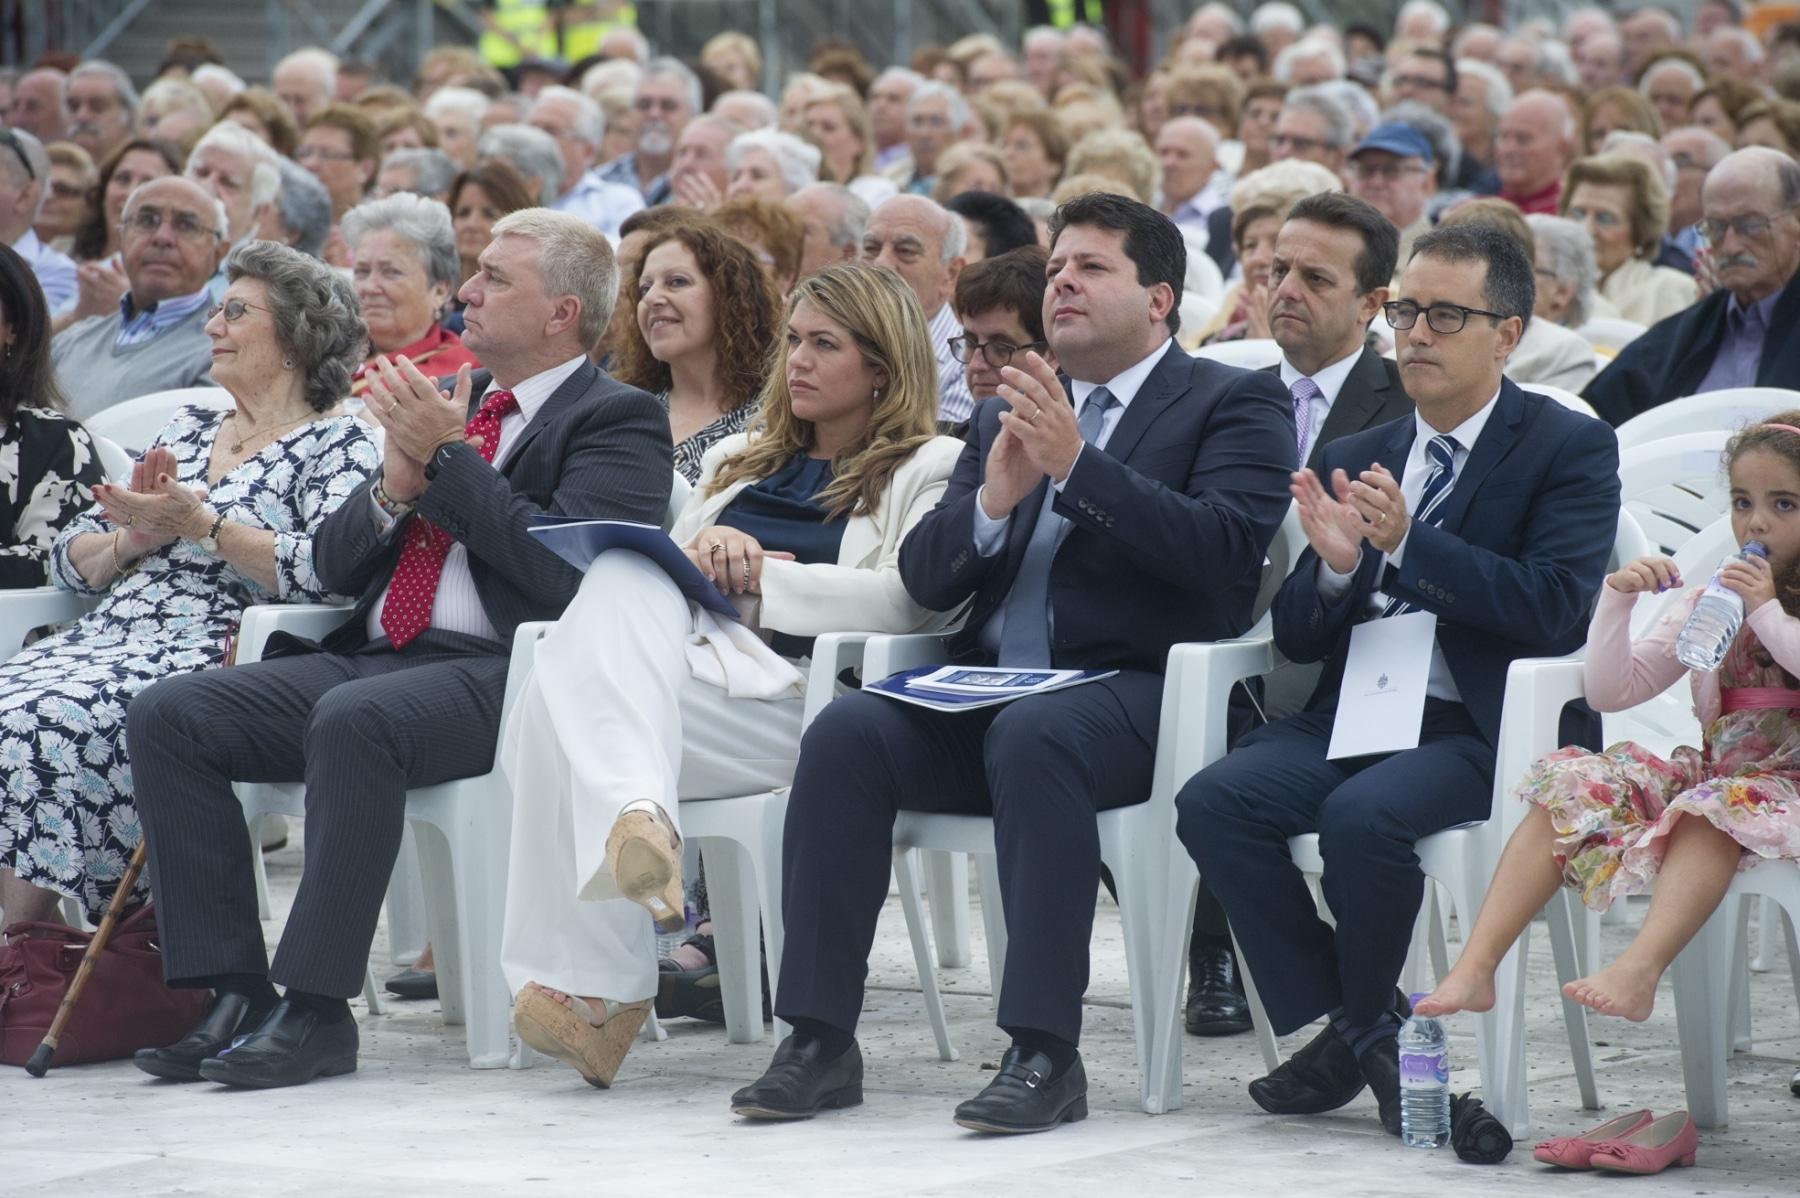 concierto-evacuados-de-gibraltar-07092015-45bn_20617814693_o